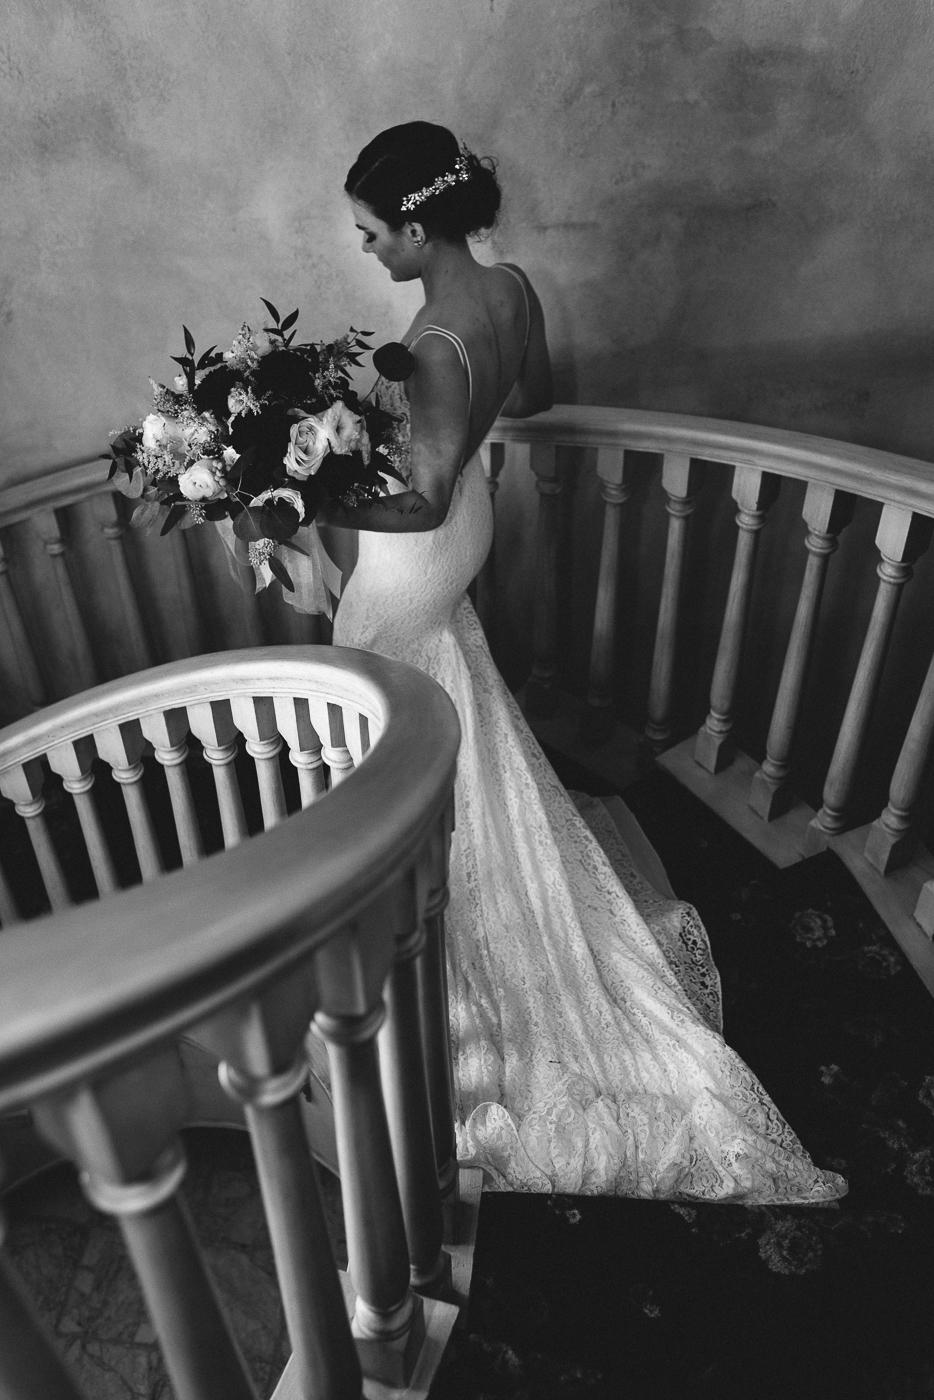 elegant bride descending spiral staircase with bouquet black and white bridal portrait